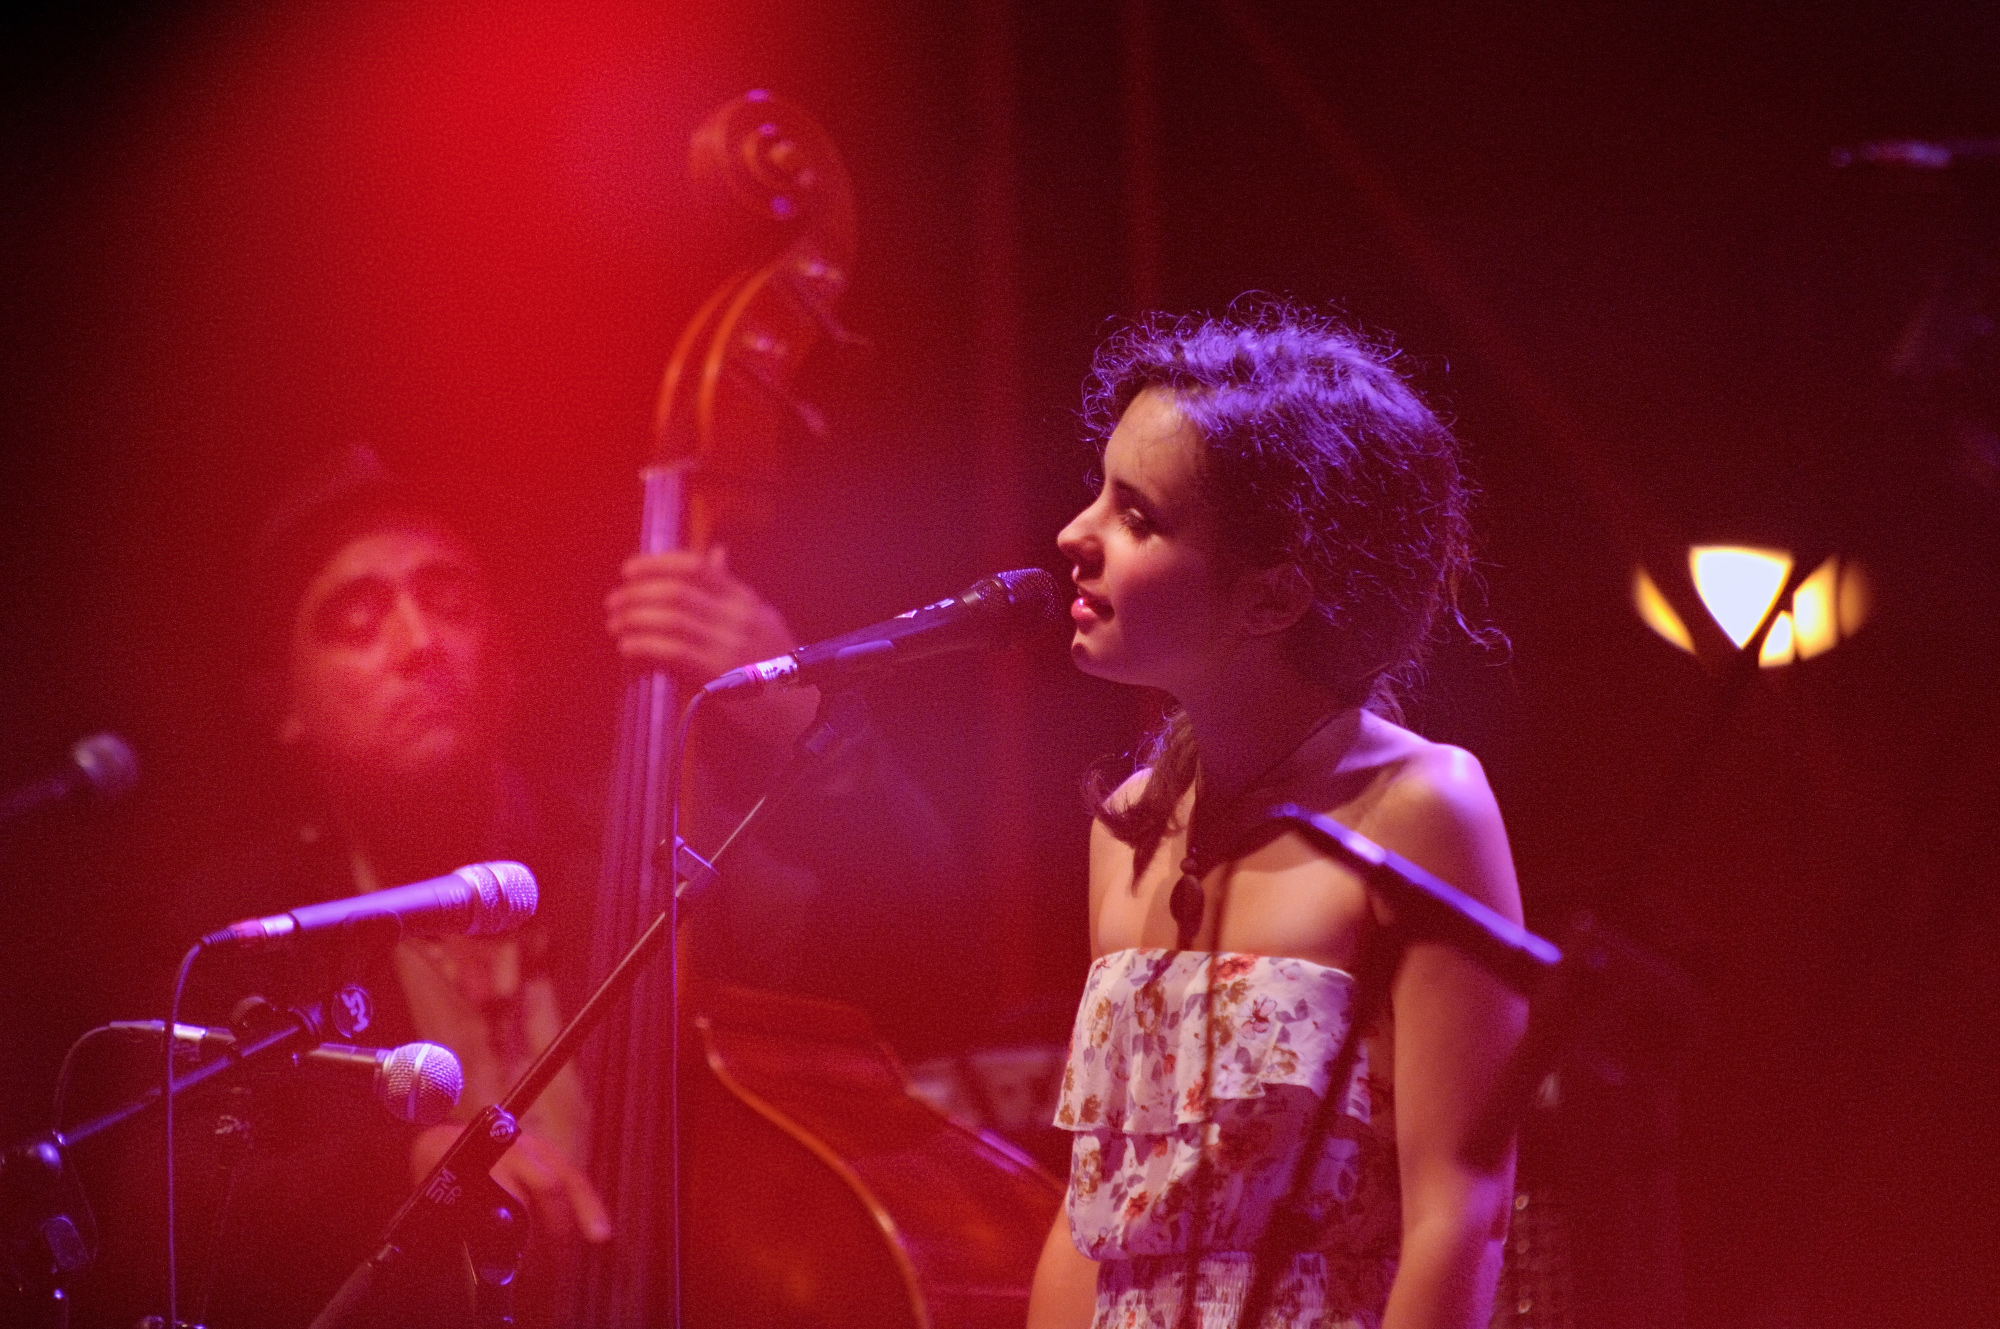 Joan-xamorro-Toni Sanchis 1